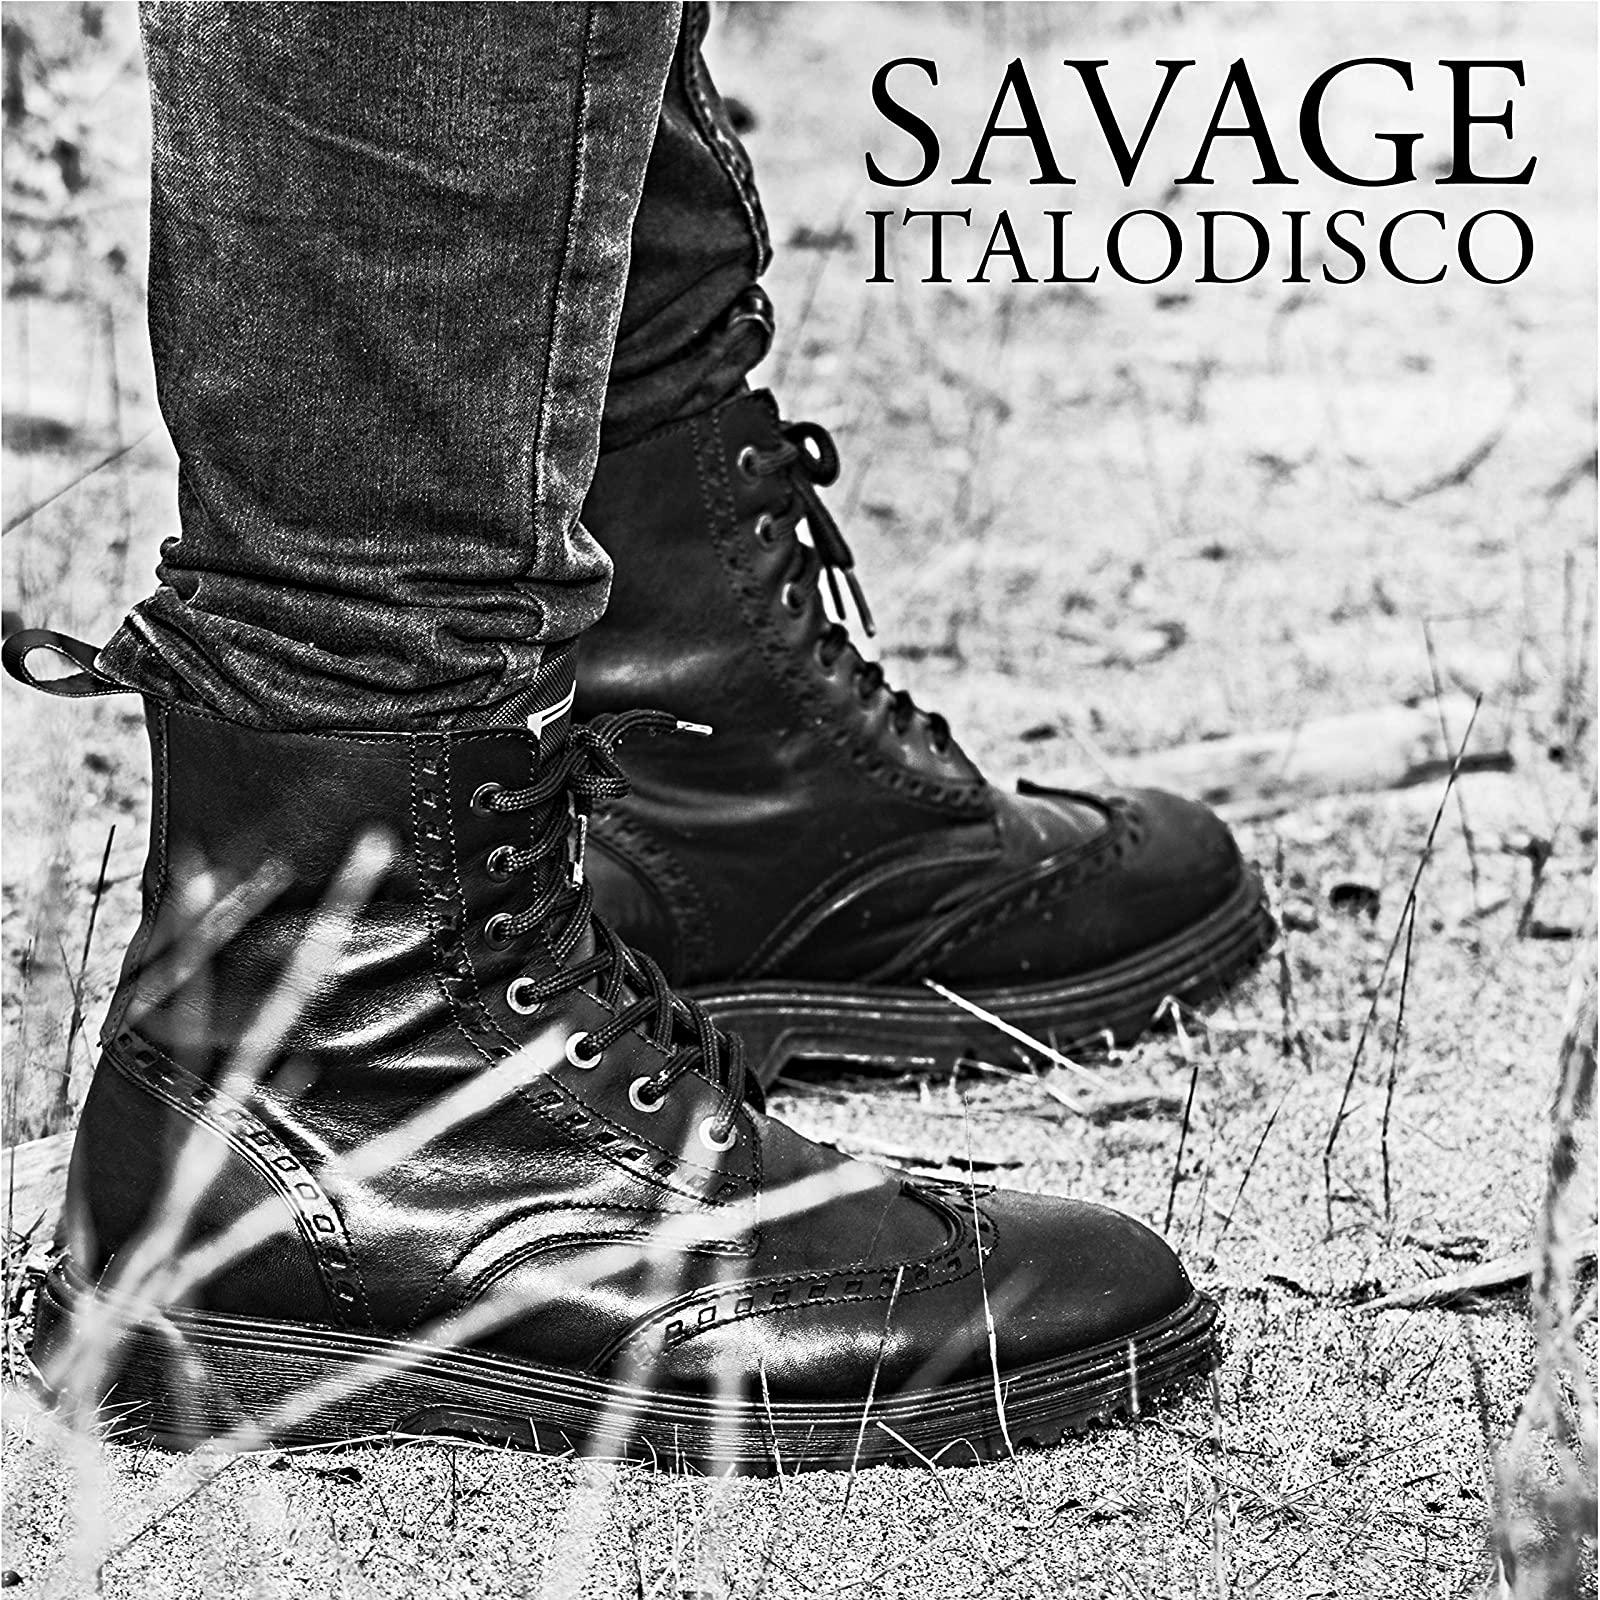 Savage new single is entitled Italodisco